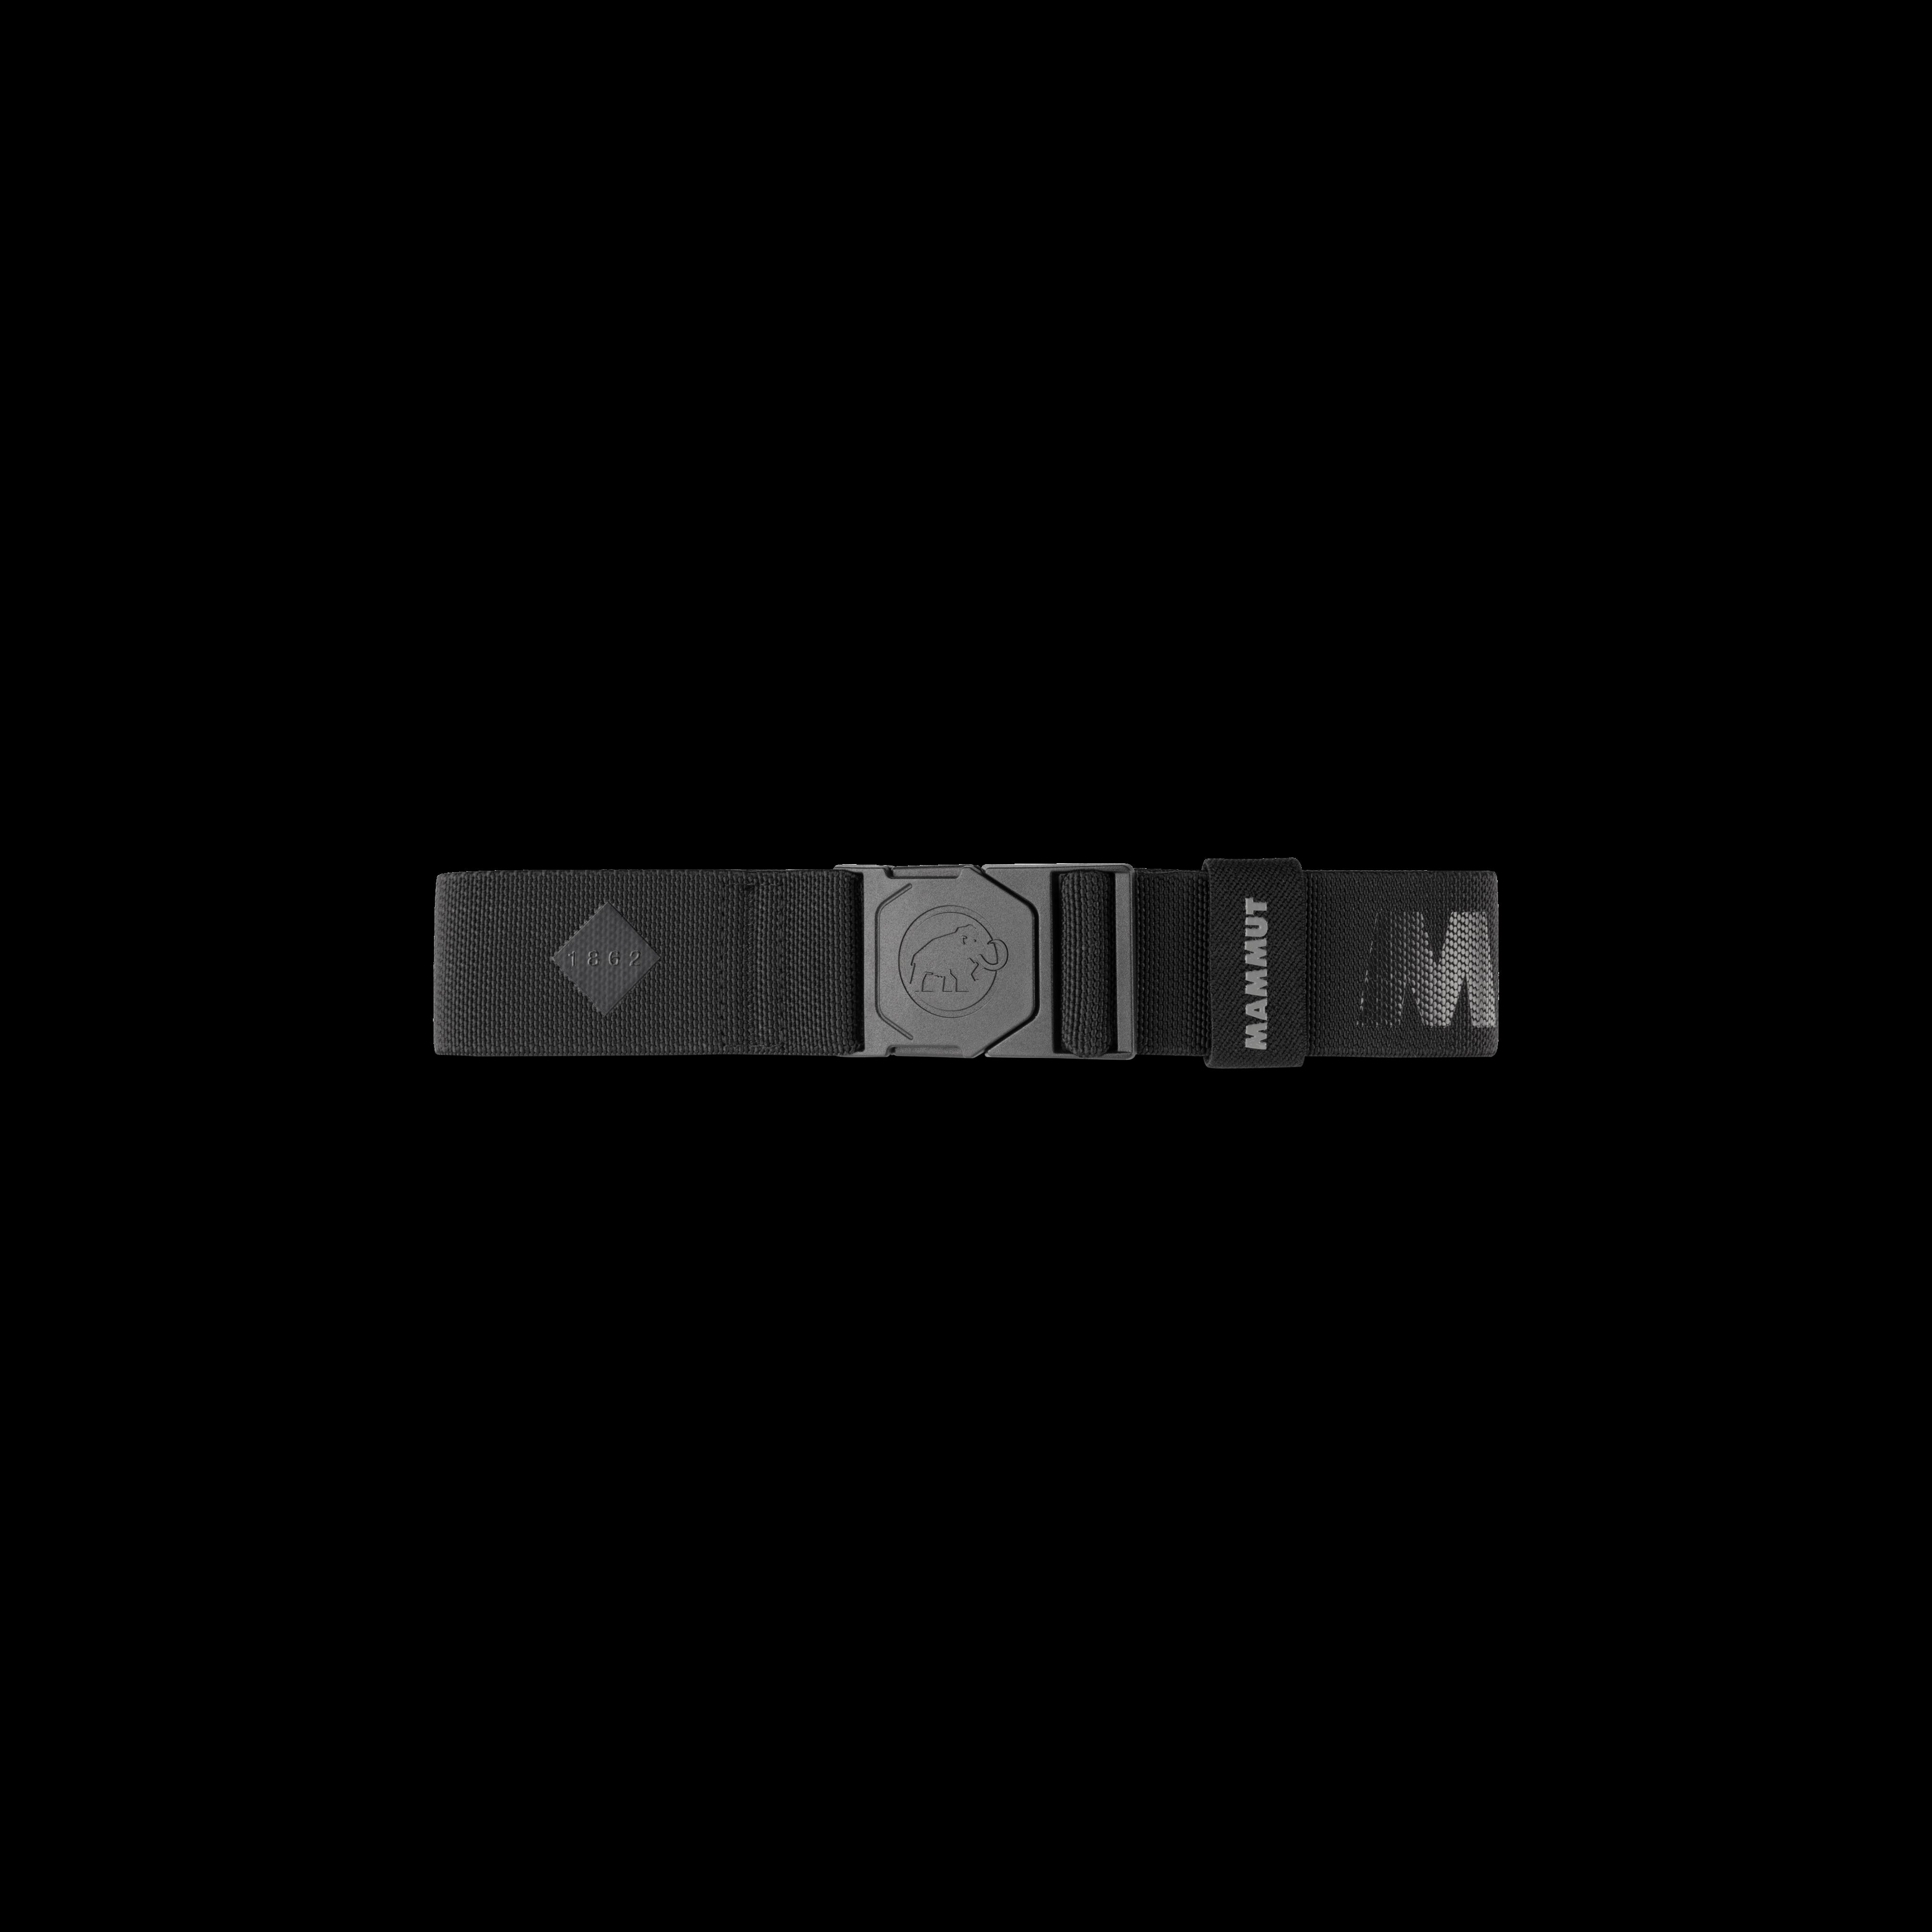 Alpine Belt - black, one size thumbnail